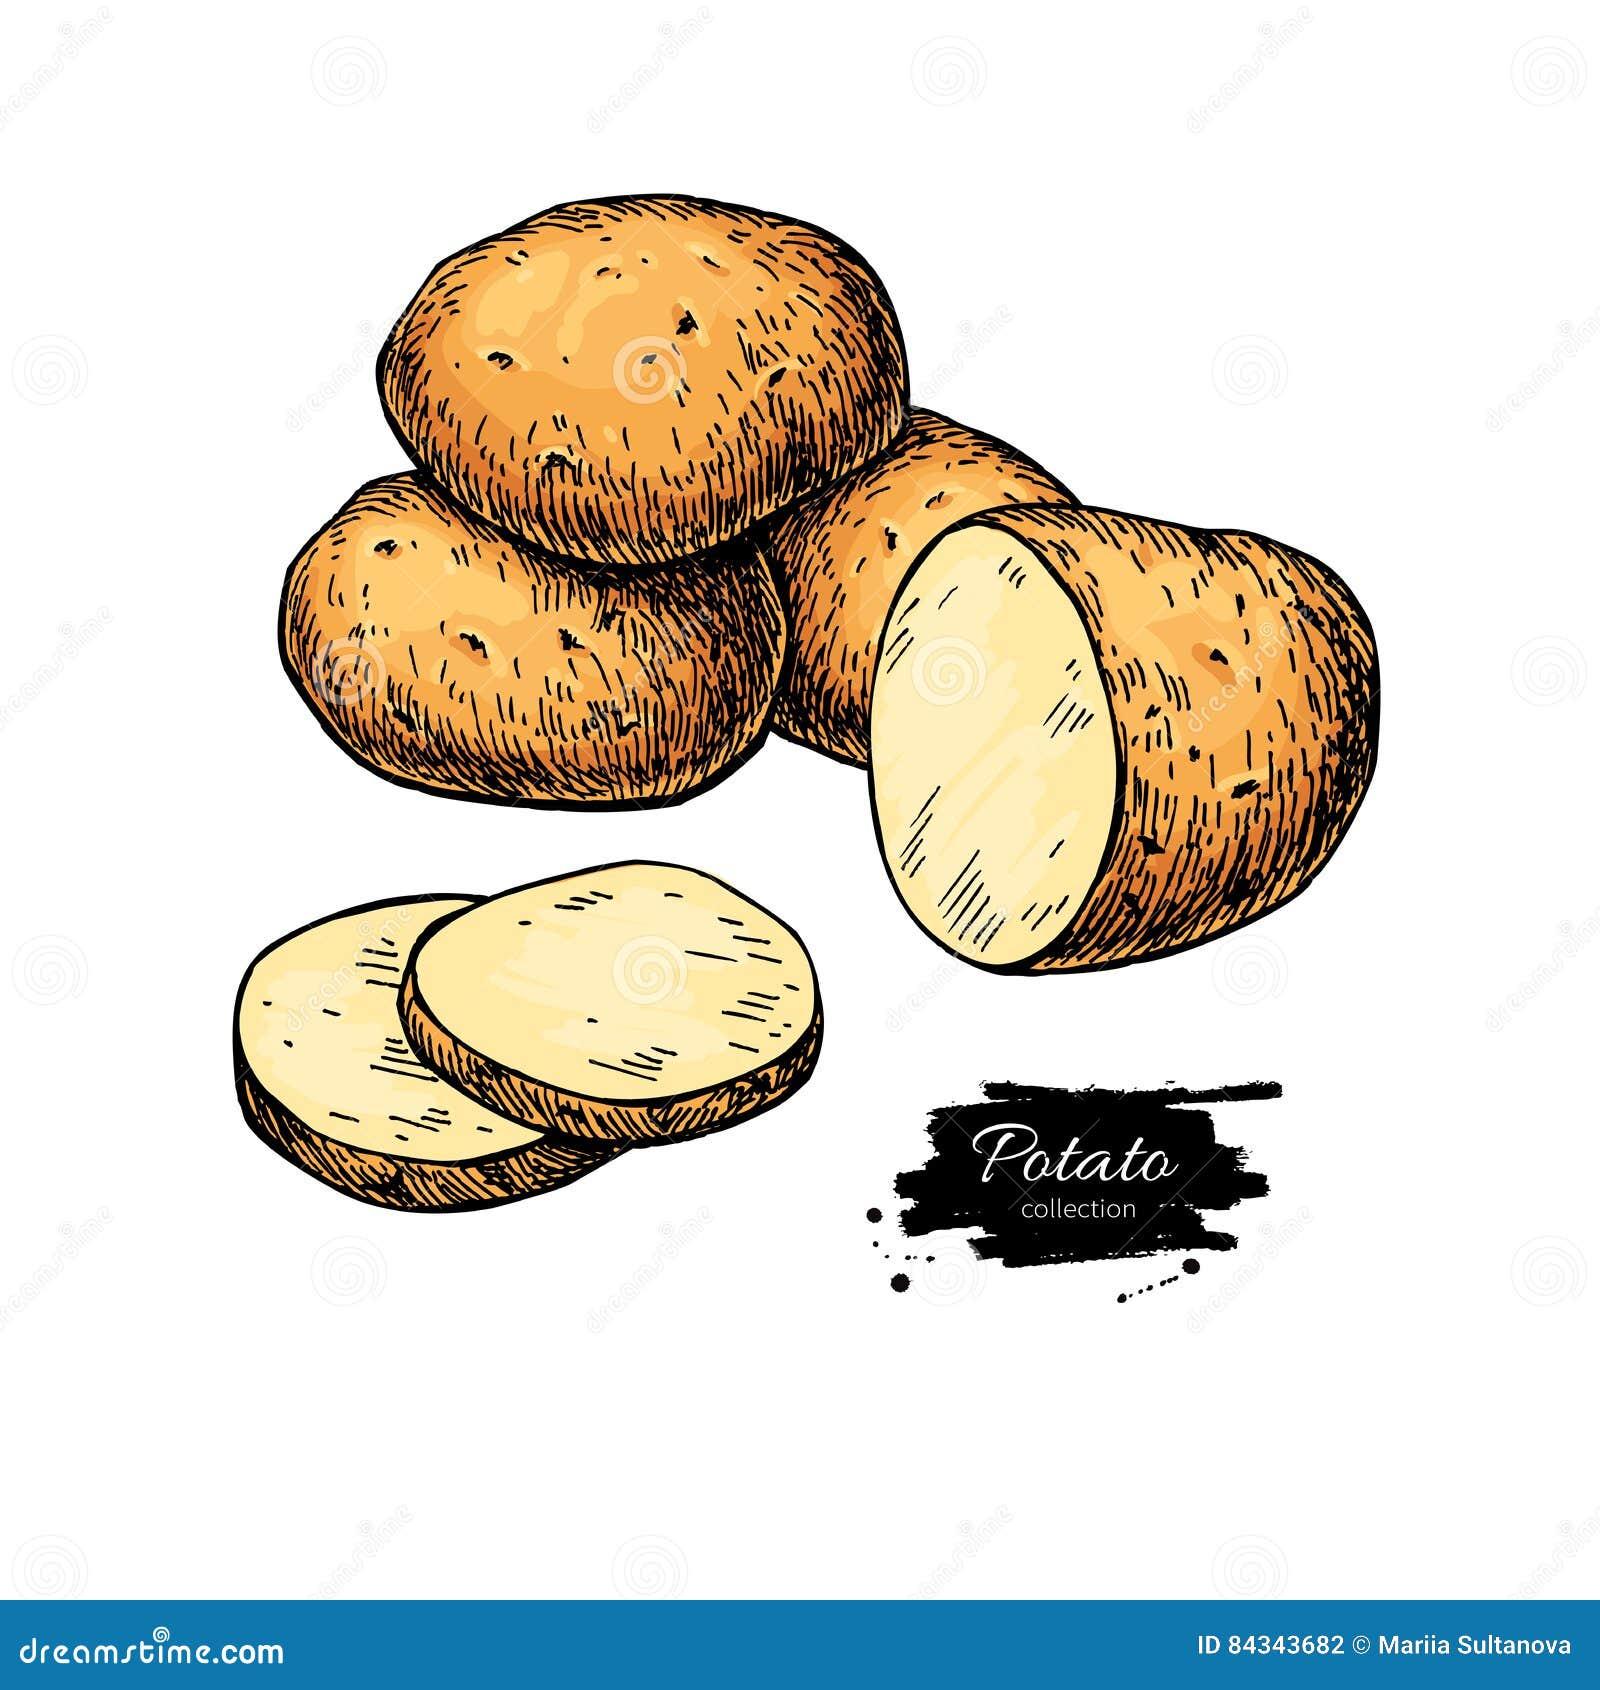 Dibujo Del Vector De La Patata Patatas Dibujadas Mano Aisladas